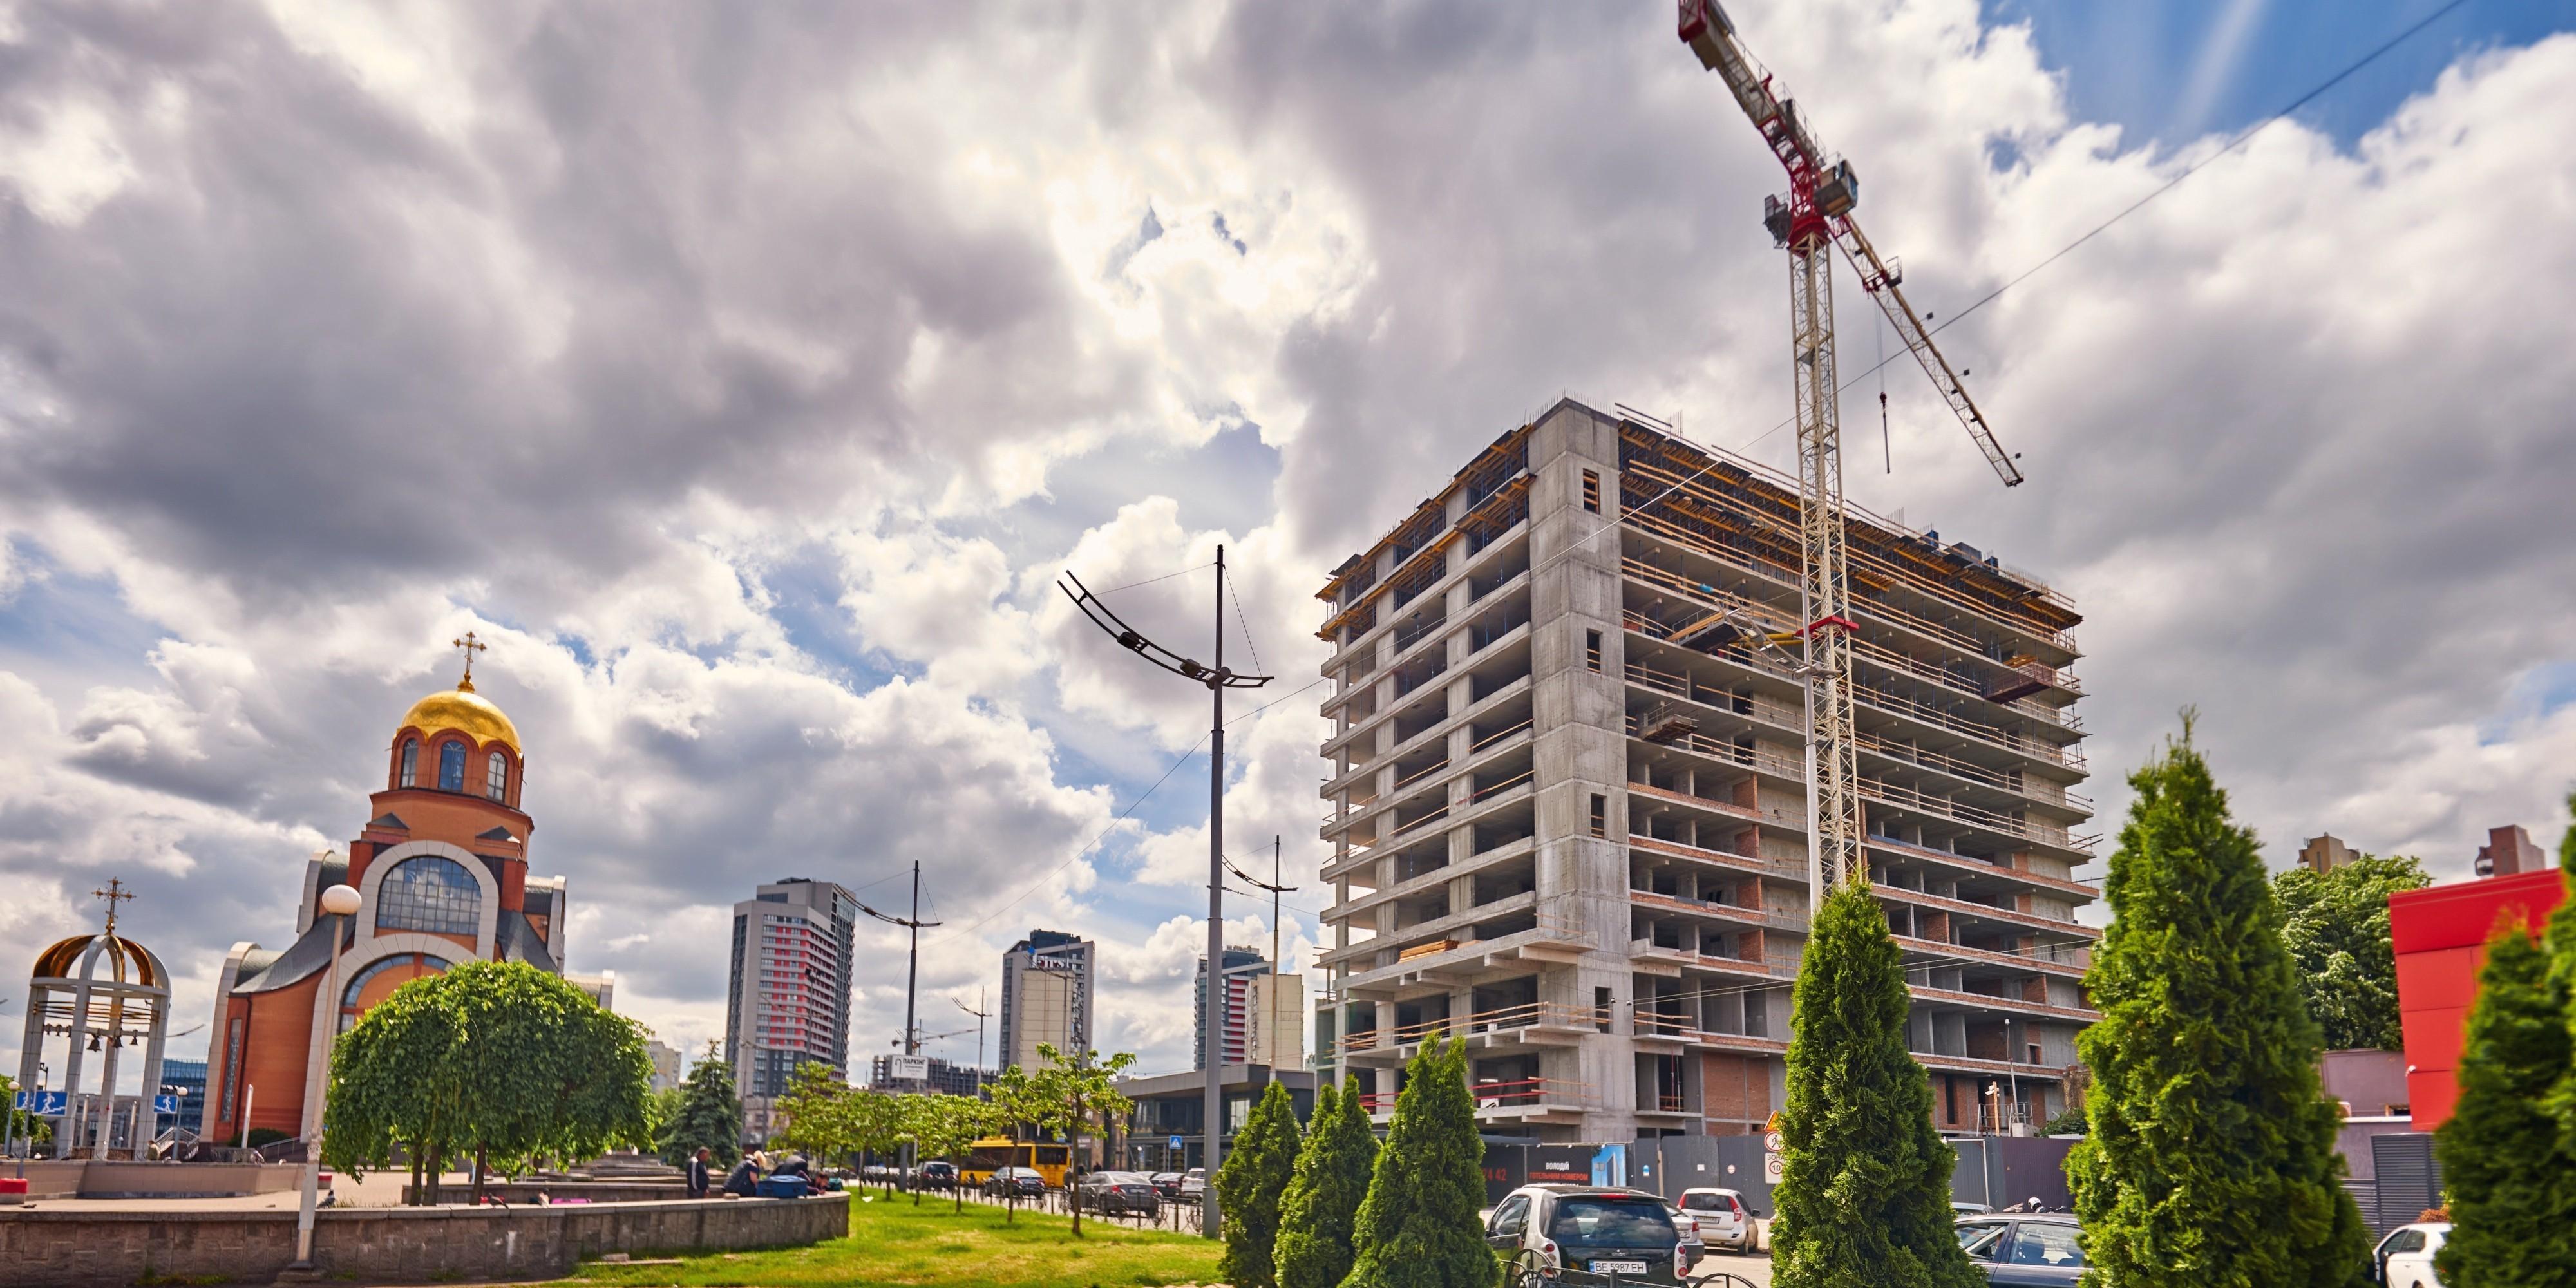 Construction progress of S1 TERMINAL. MAY 2021